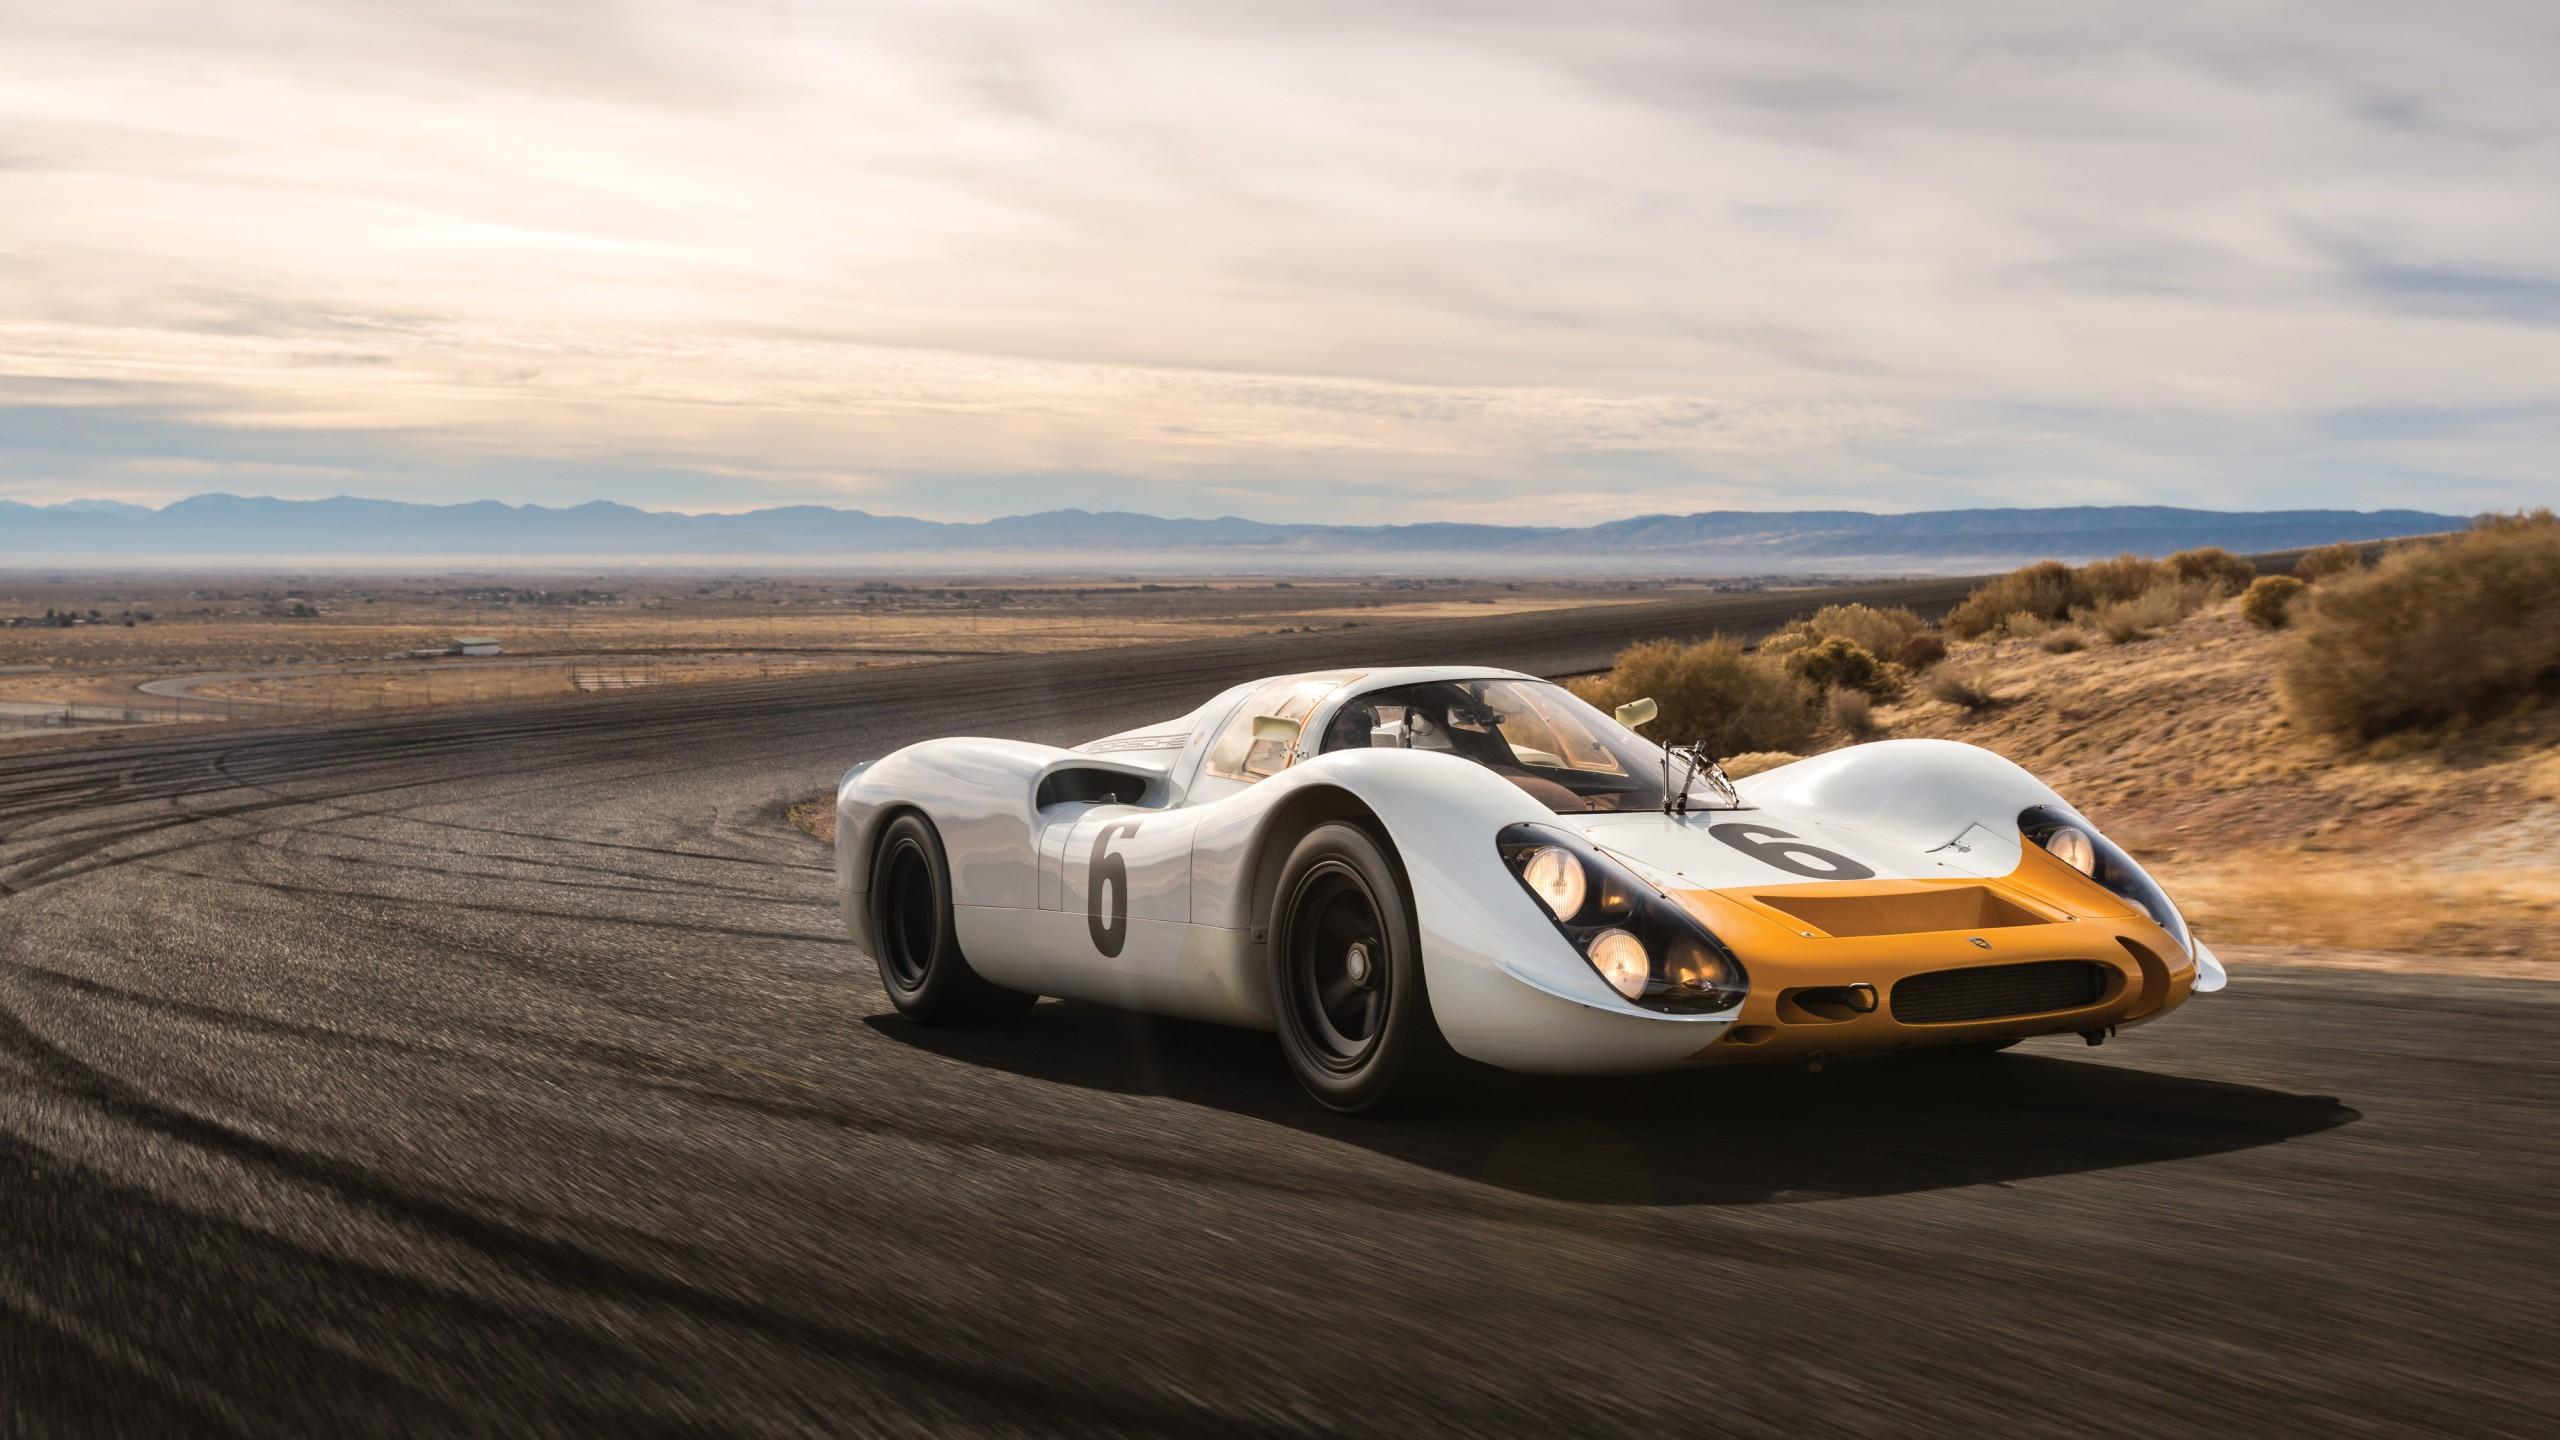 Aston Martin Race Car Wallpaper Porsche 908 Kurzheck Coupe 4k Wallpaper Hd Car